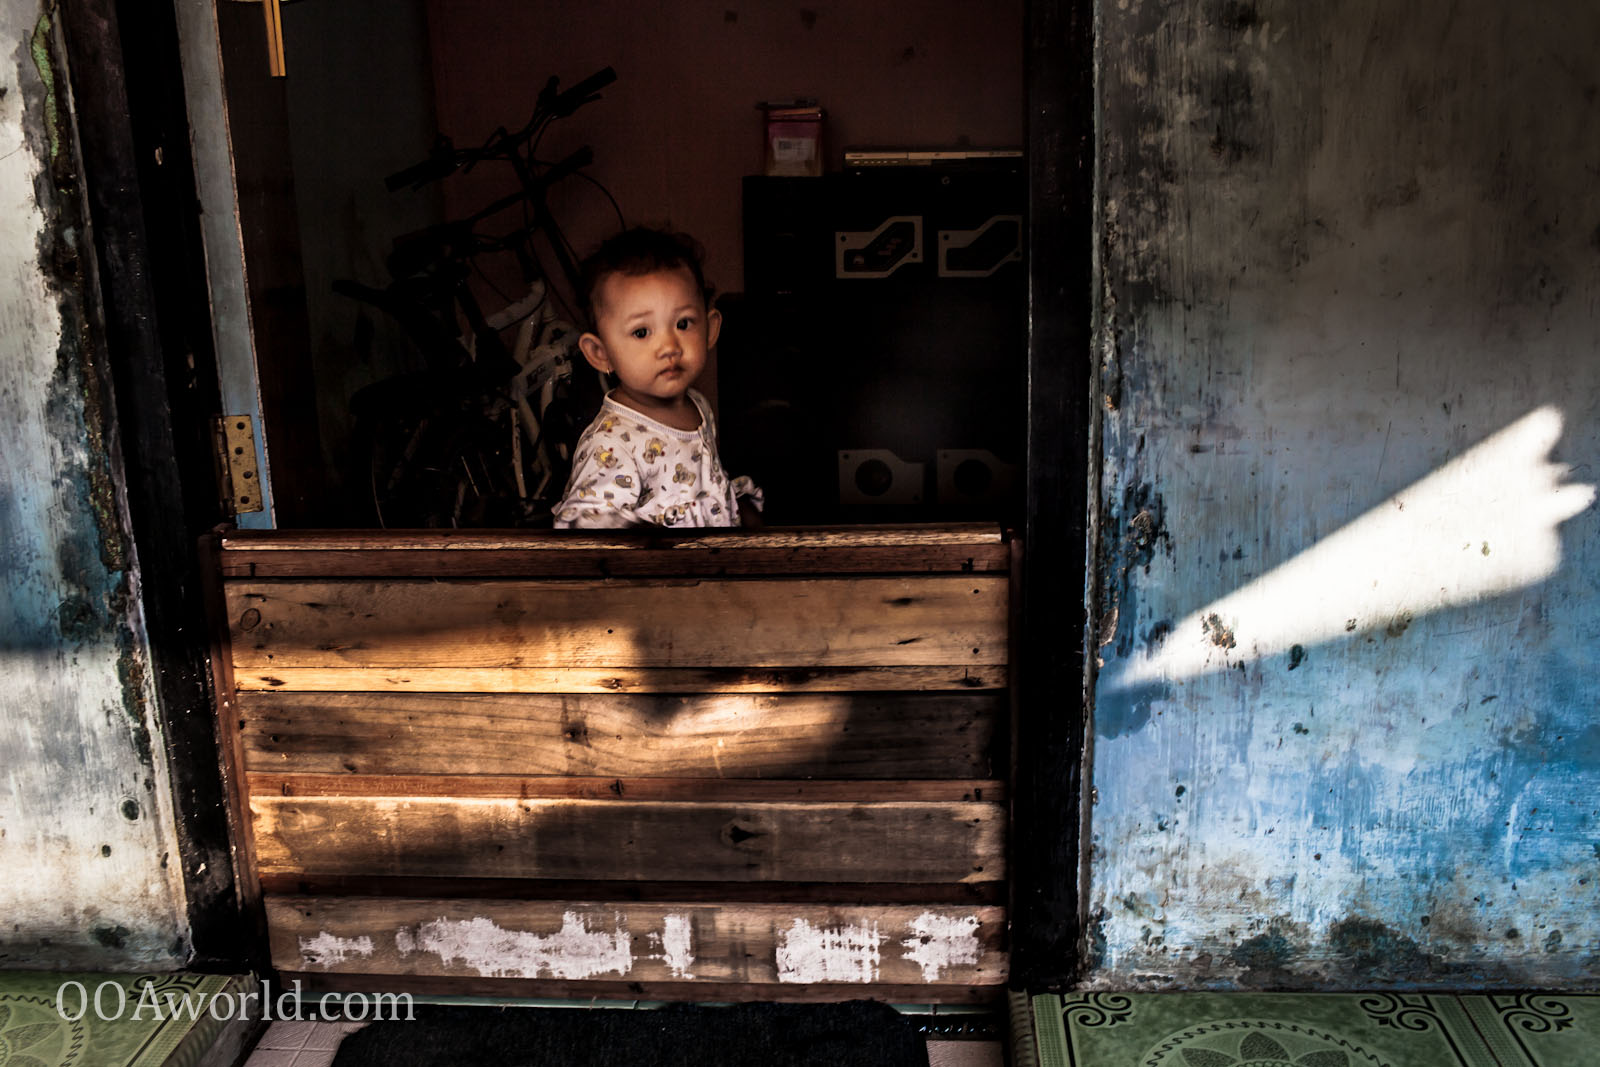 Innocence Jakarta Indonesia Photo Ooaworld